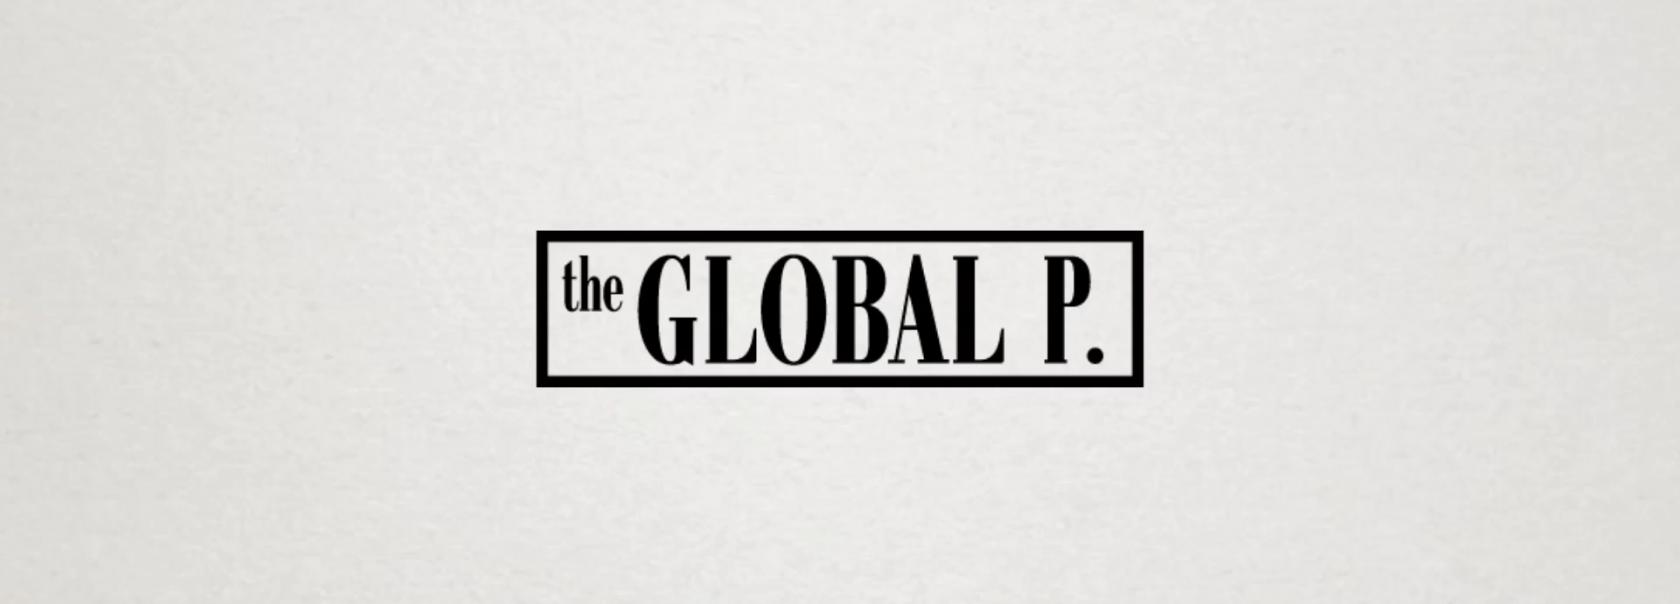 Global P.